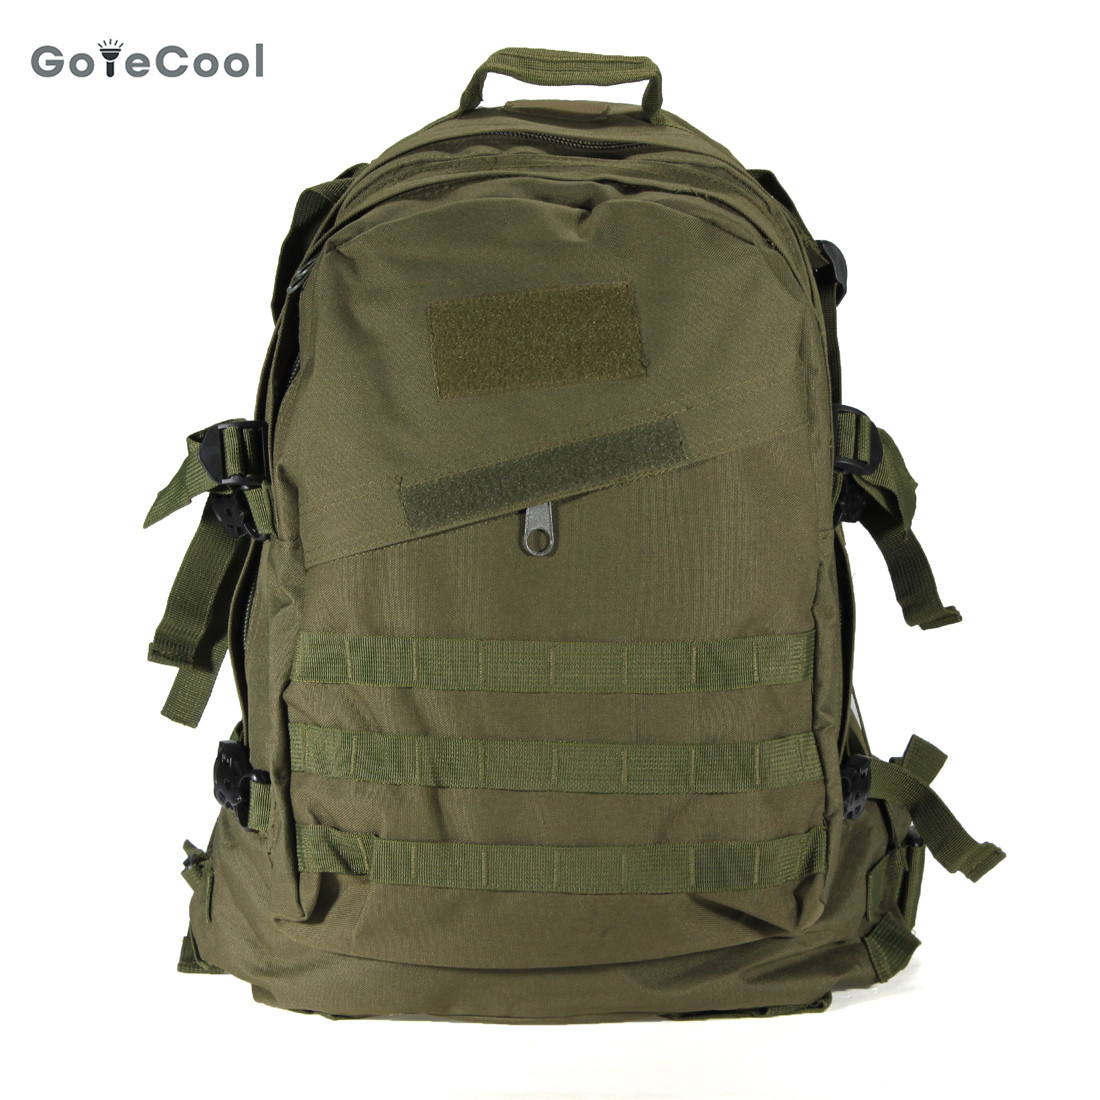 4131b8f80f 55L 3D Outdoor Sport nylon Military Tactical Backpack Rucksack travel Bag  Camping Hiking climbing bag